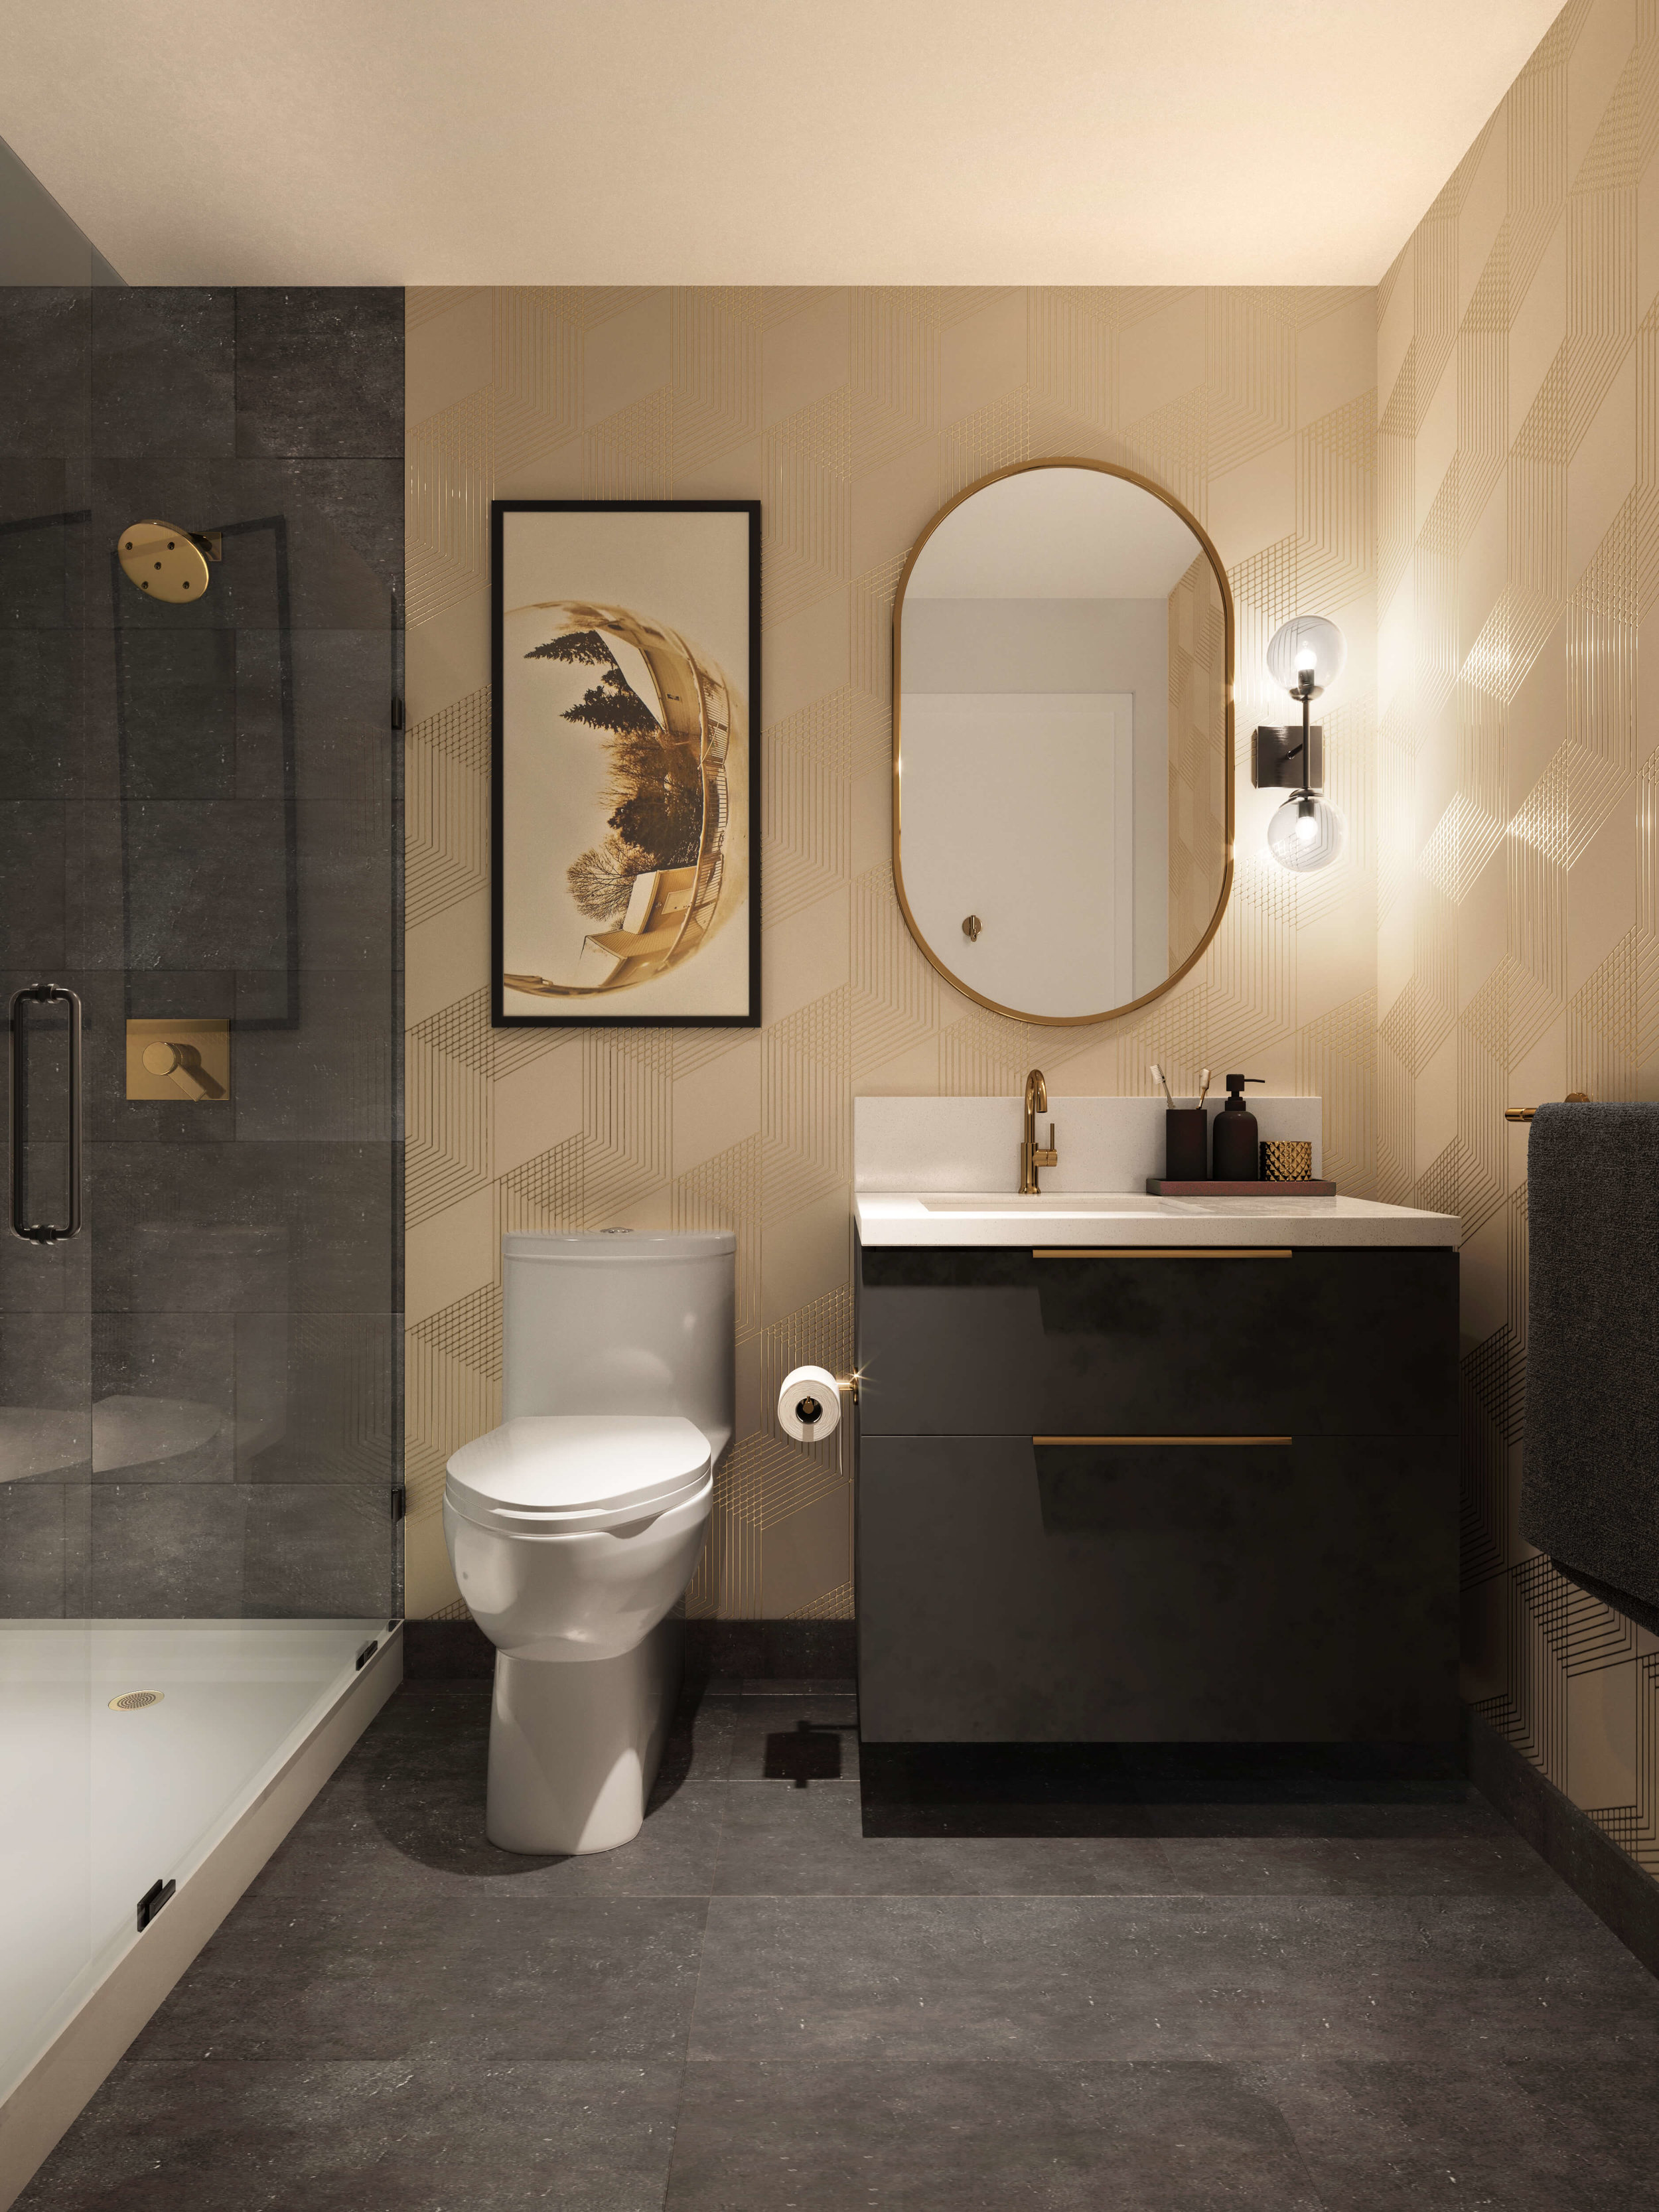 POE-C6-Bathroom-181018-FINAL-HR.jpg